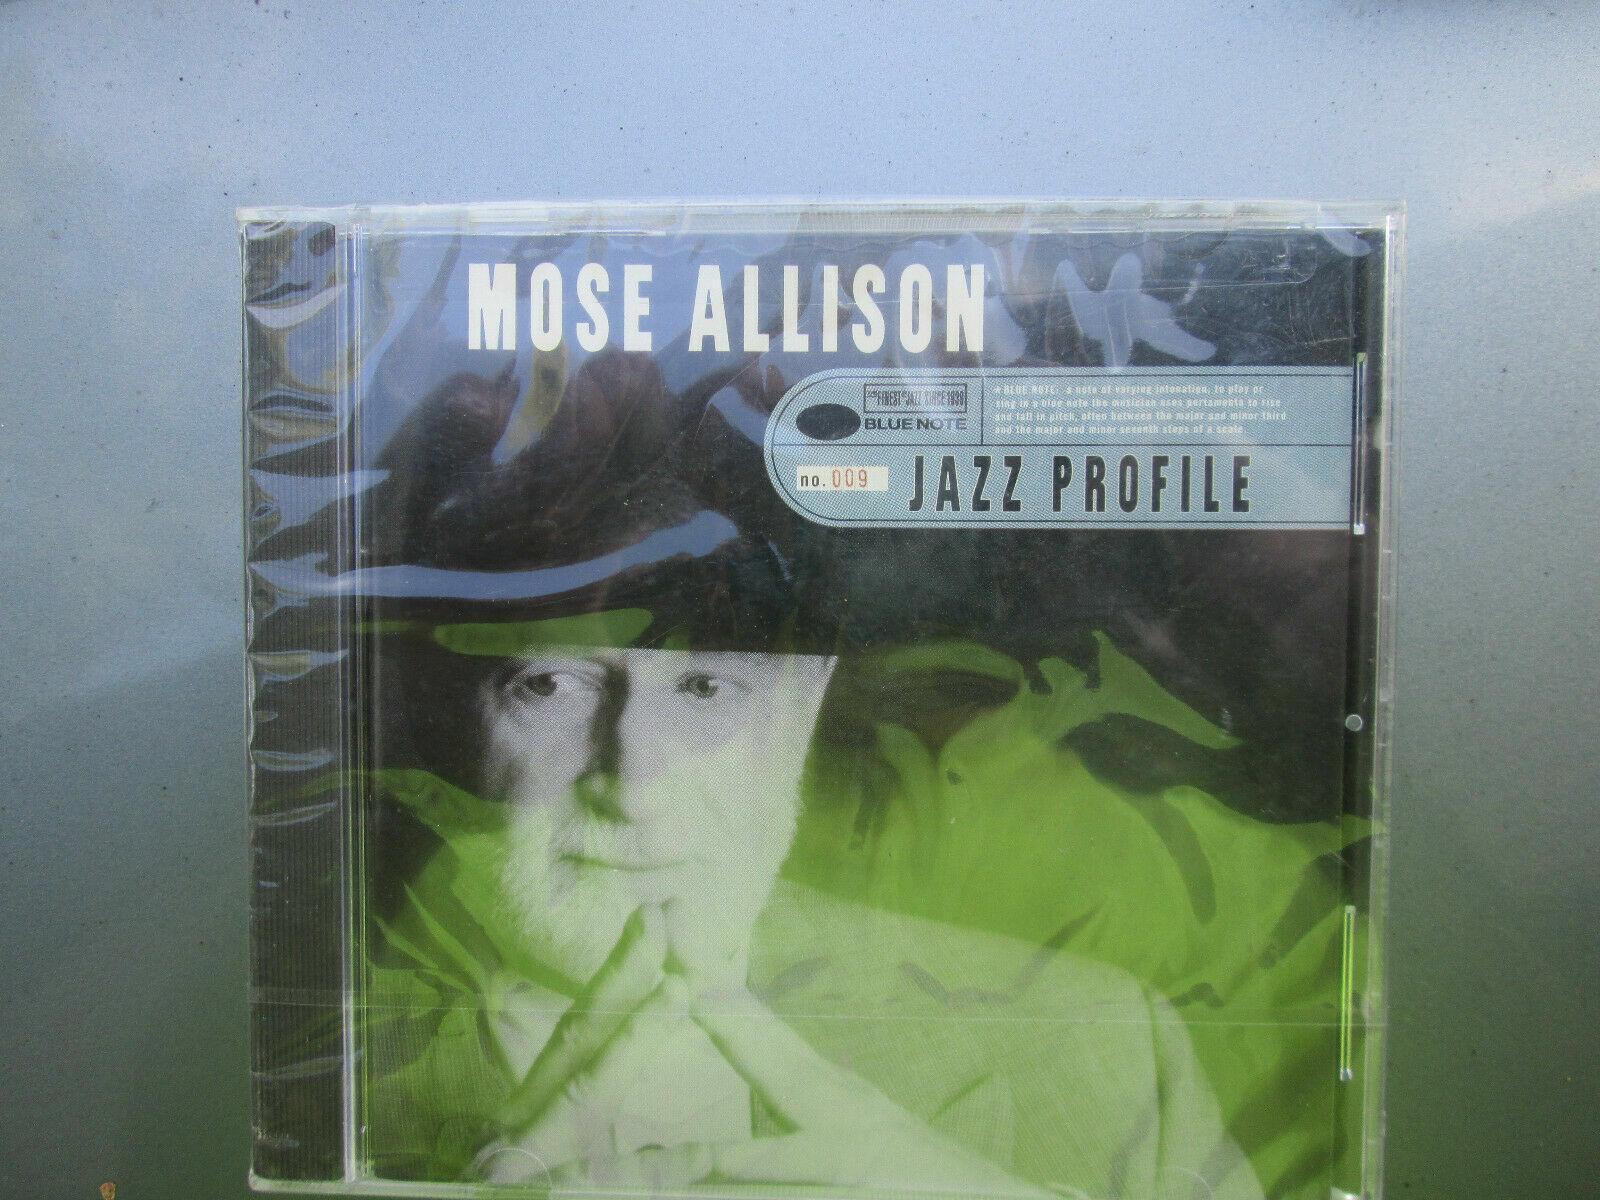 Mose Allison Jazz Profile CD Album MINT SEALED COPY  - $12.99